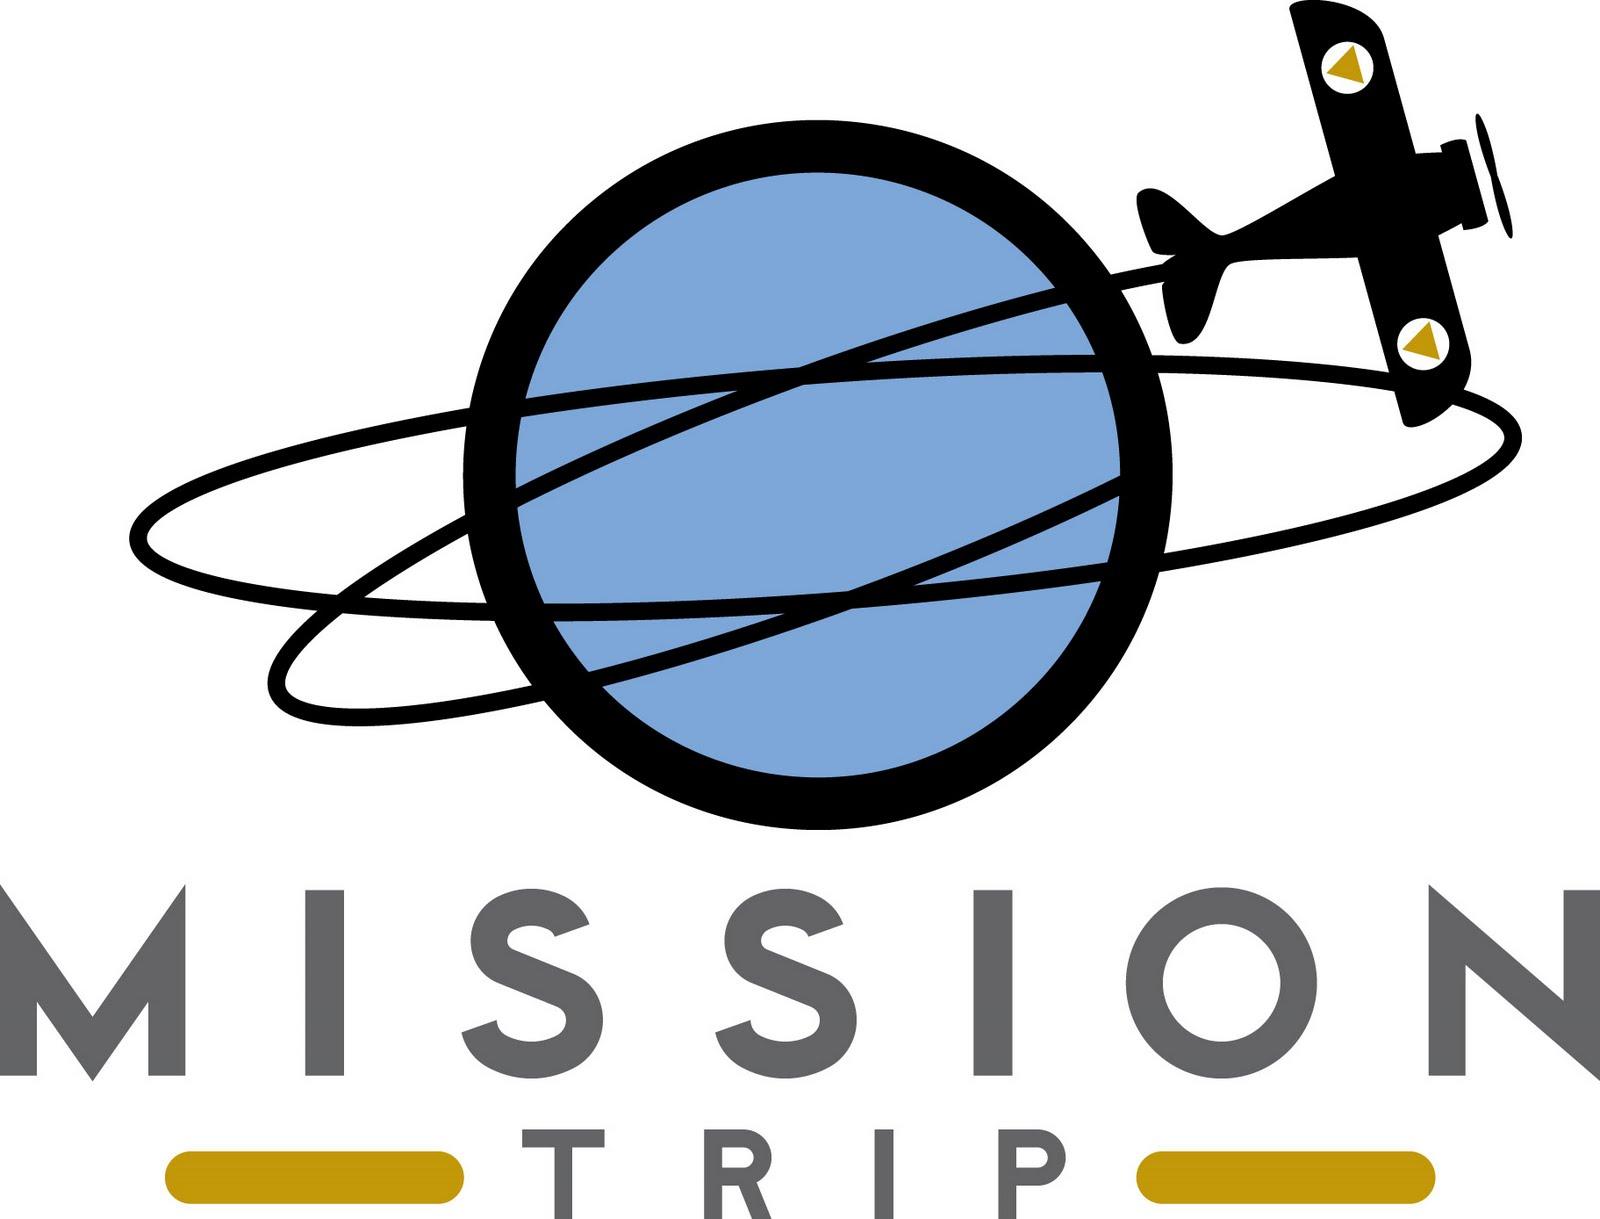 1600x1219 Mission Trip Clipart